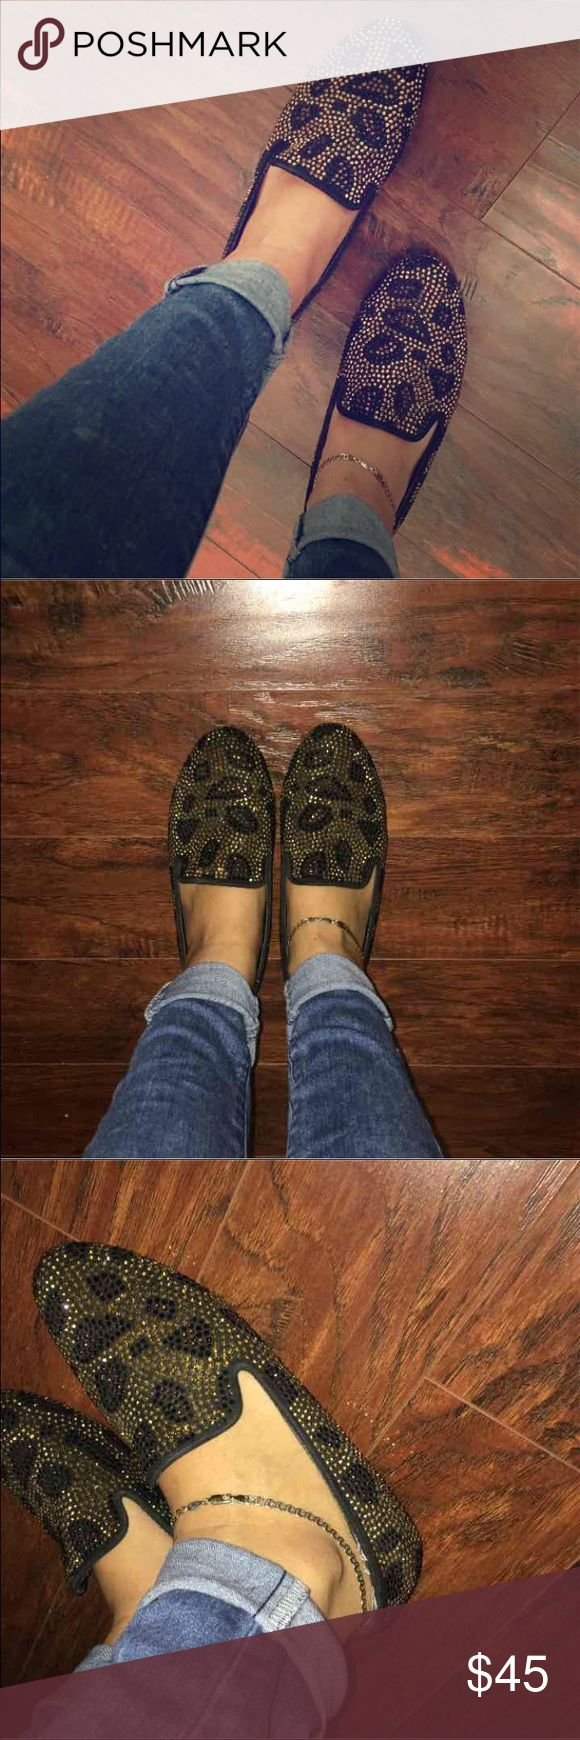 Steve Madden Loafers Cheetah/Leopard print Steve Madden loafers. Worn a few times. Originally $100. Steve Madden Shoes Flats & Loafers